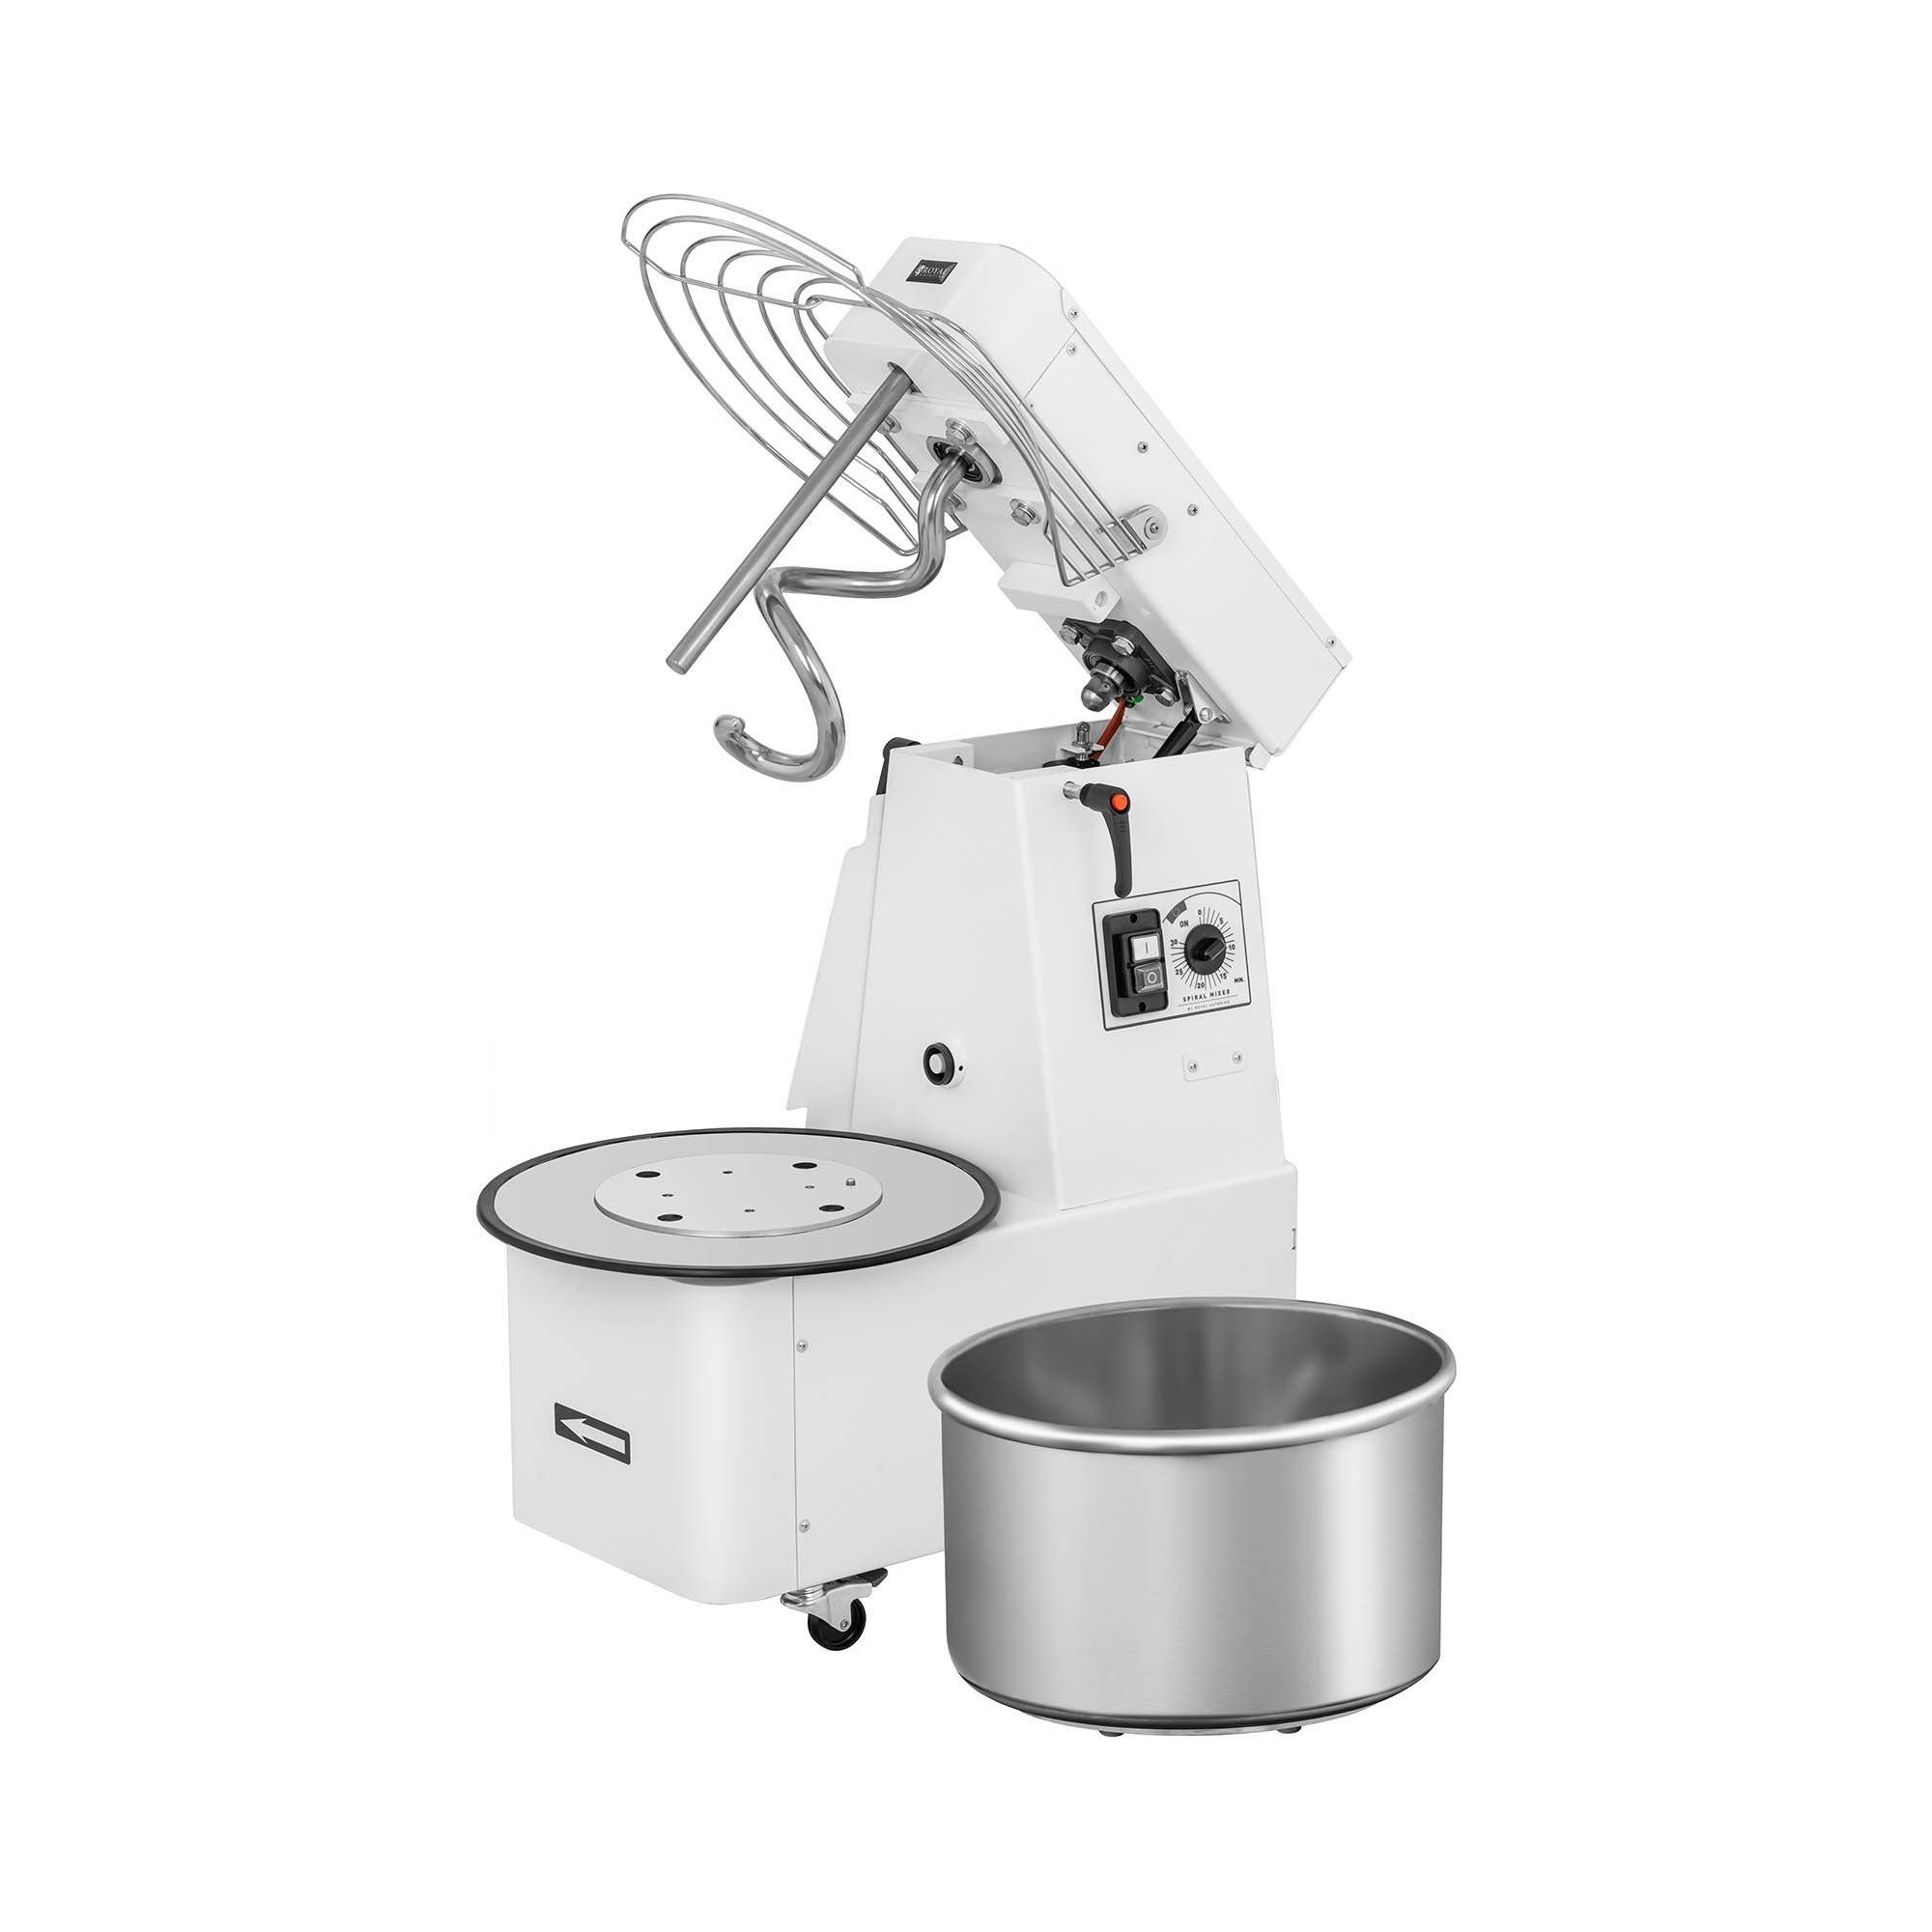 Royal Catering Impastatrice professionale a spirale - 32 litri - 88 kg/h - 1.100 W - Testa pieghevole RC-SMRH30